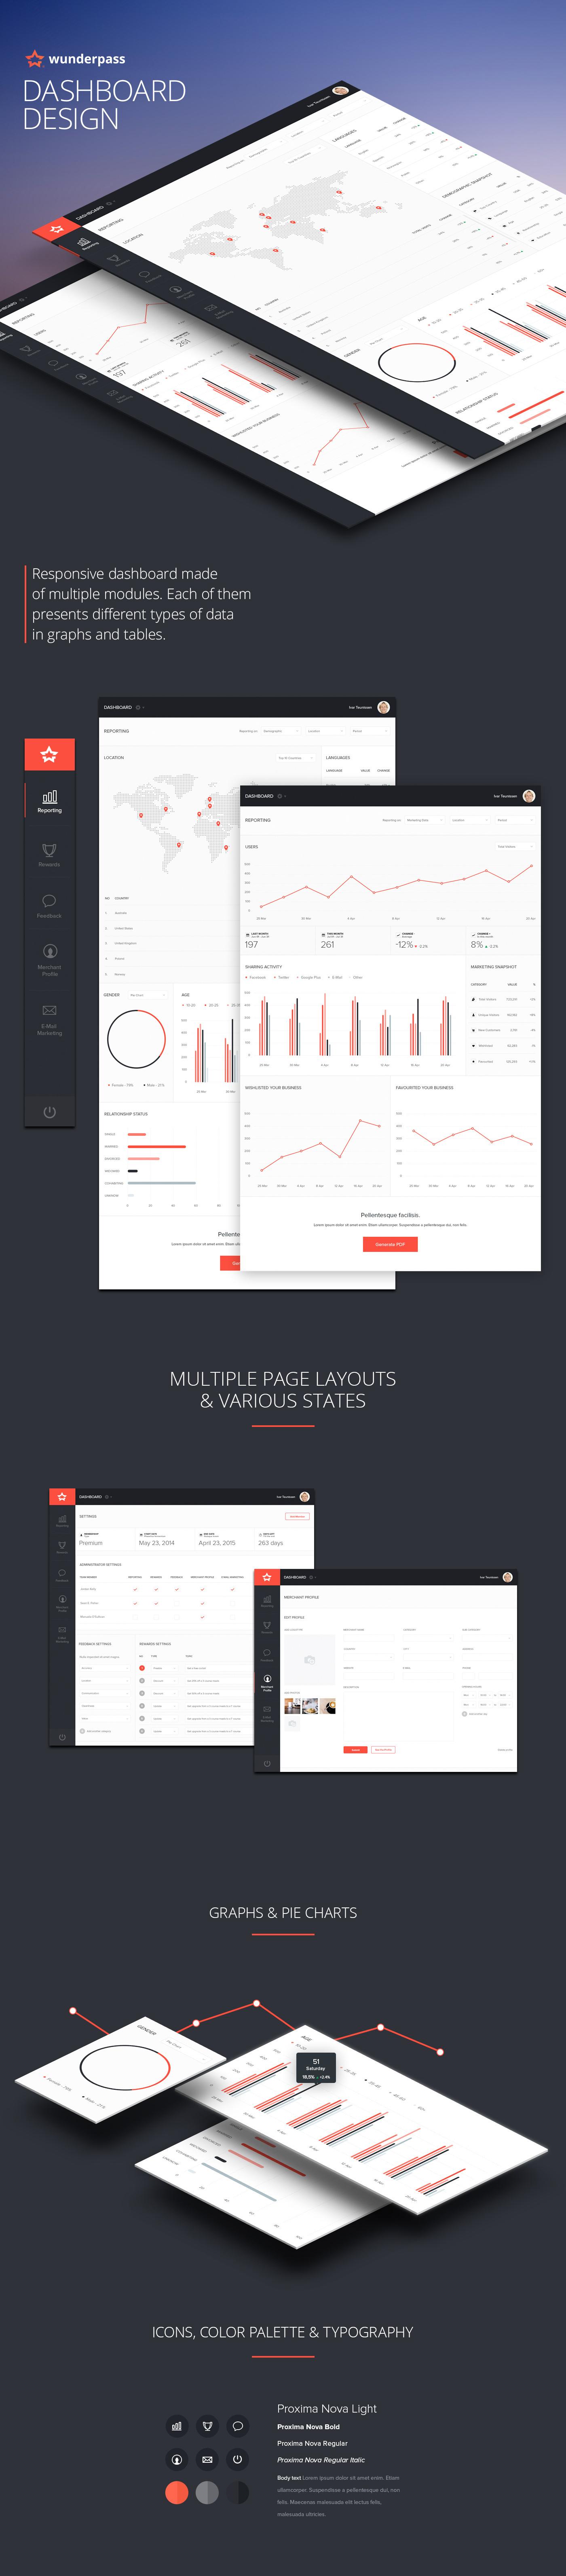 dashboard UI ux uidesign admin panel Graphs pie charts sidebar cocpit app application flat design stats Data